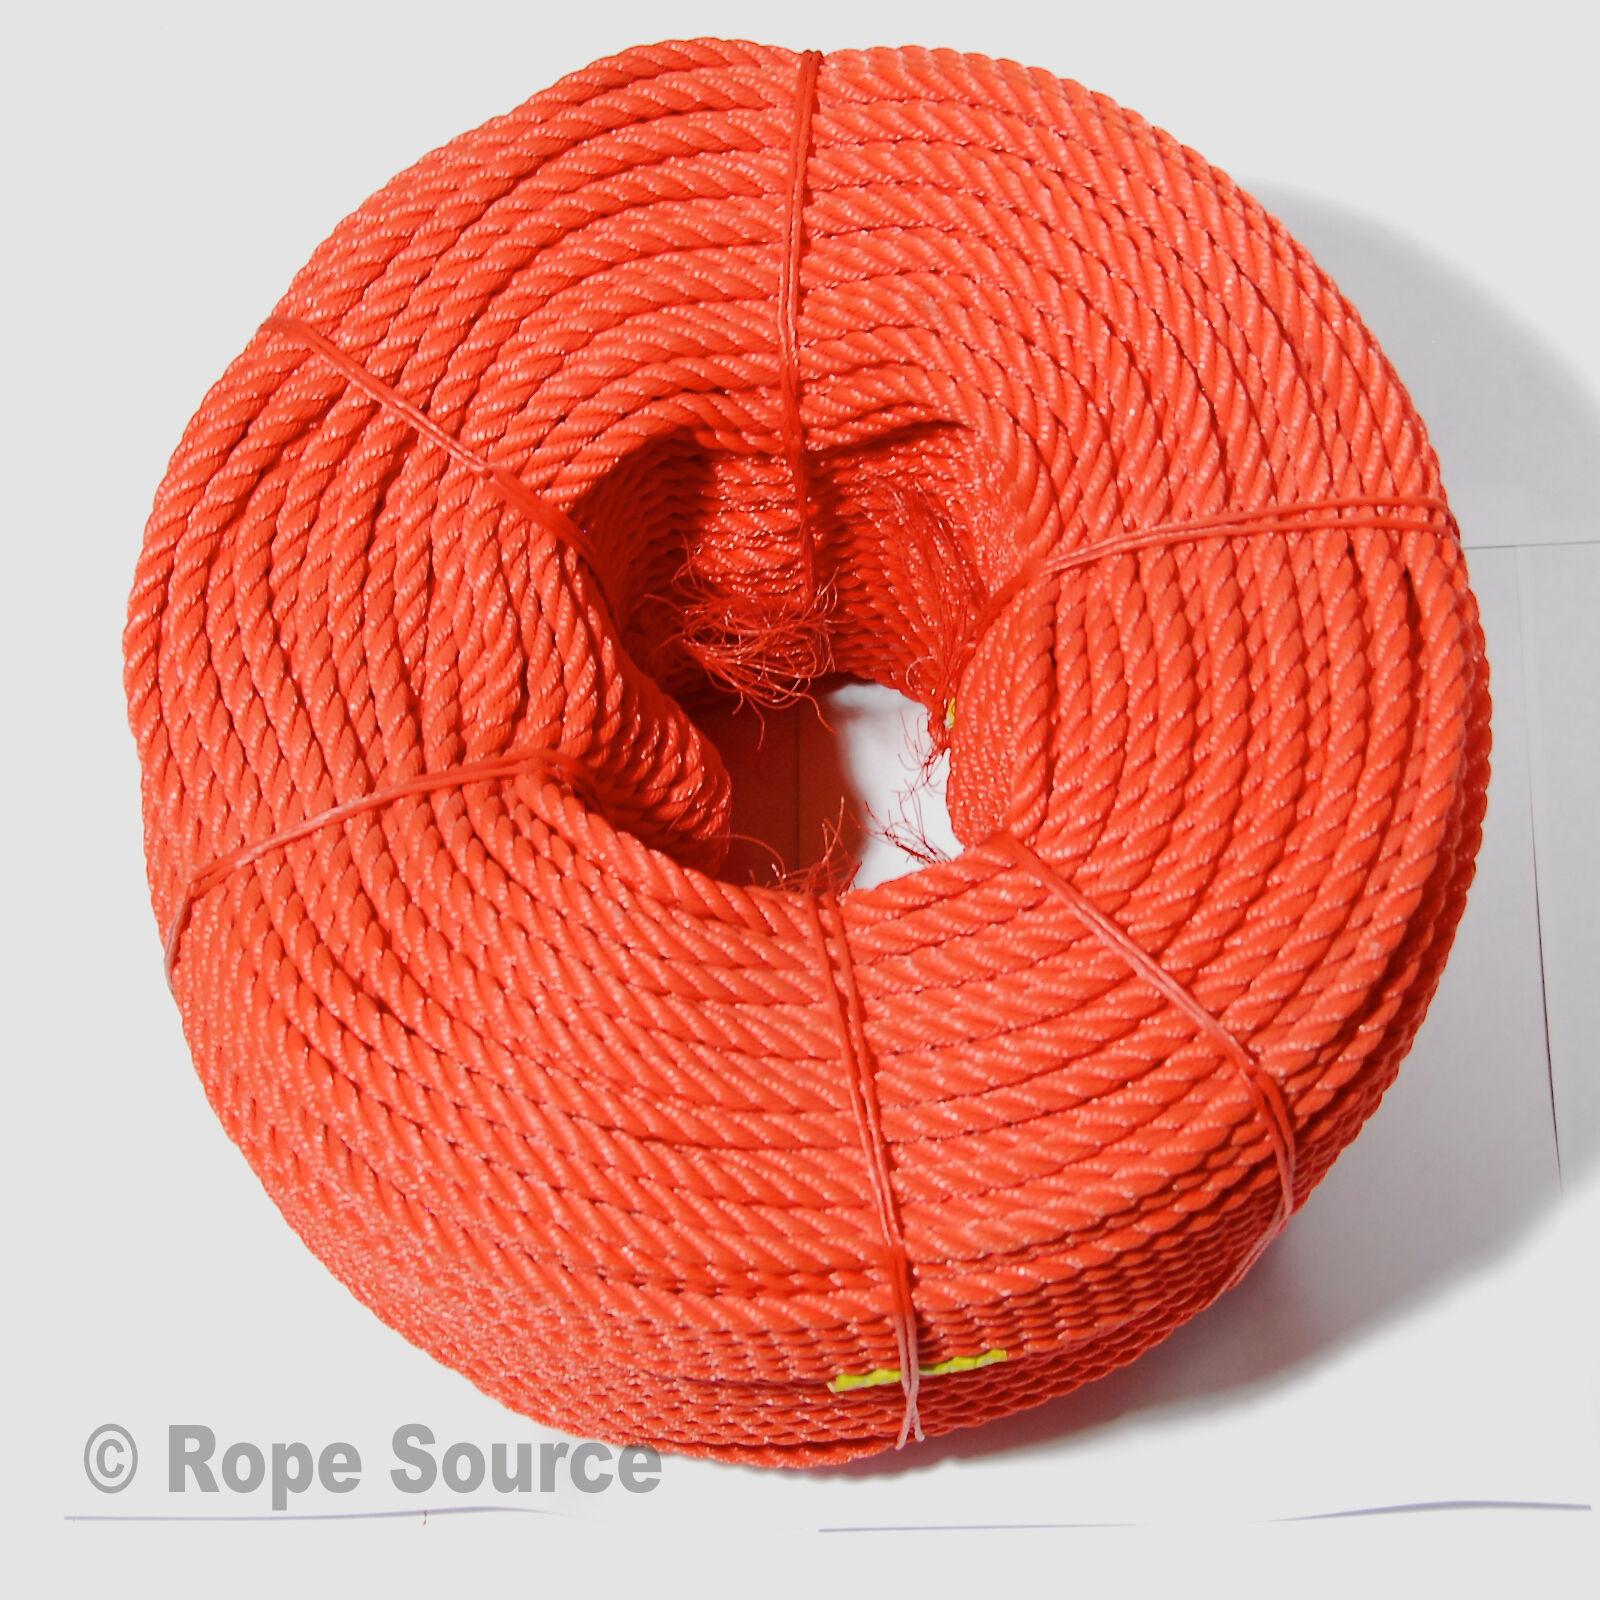 'EVERLASTO' orange FLOATING LIFELINE RESCUE ROPE - 6MM - VARIOUS LENGTHS